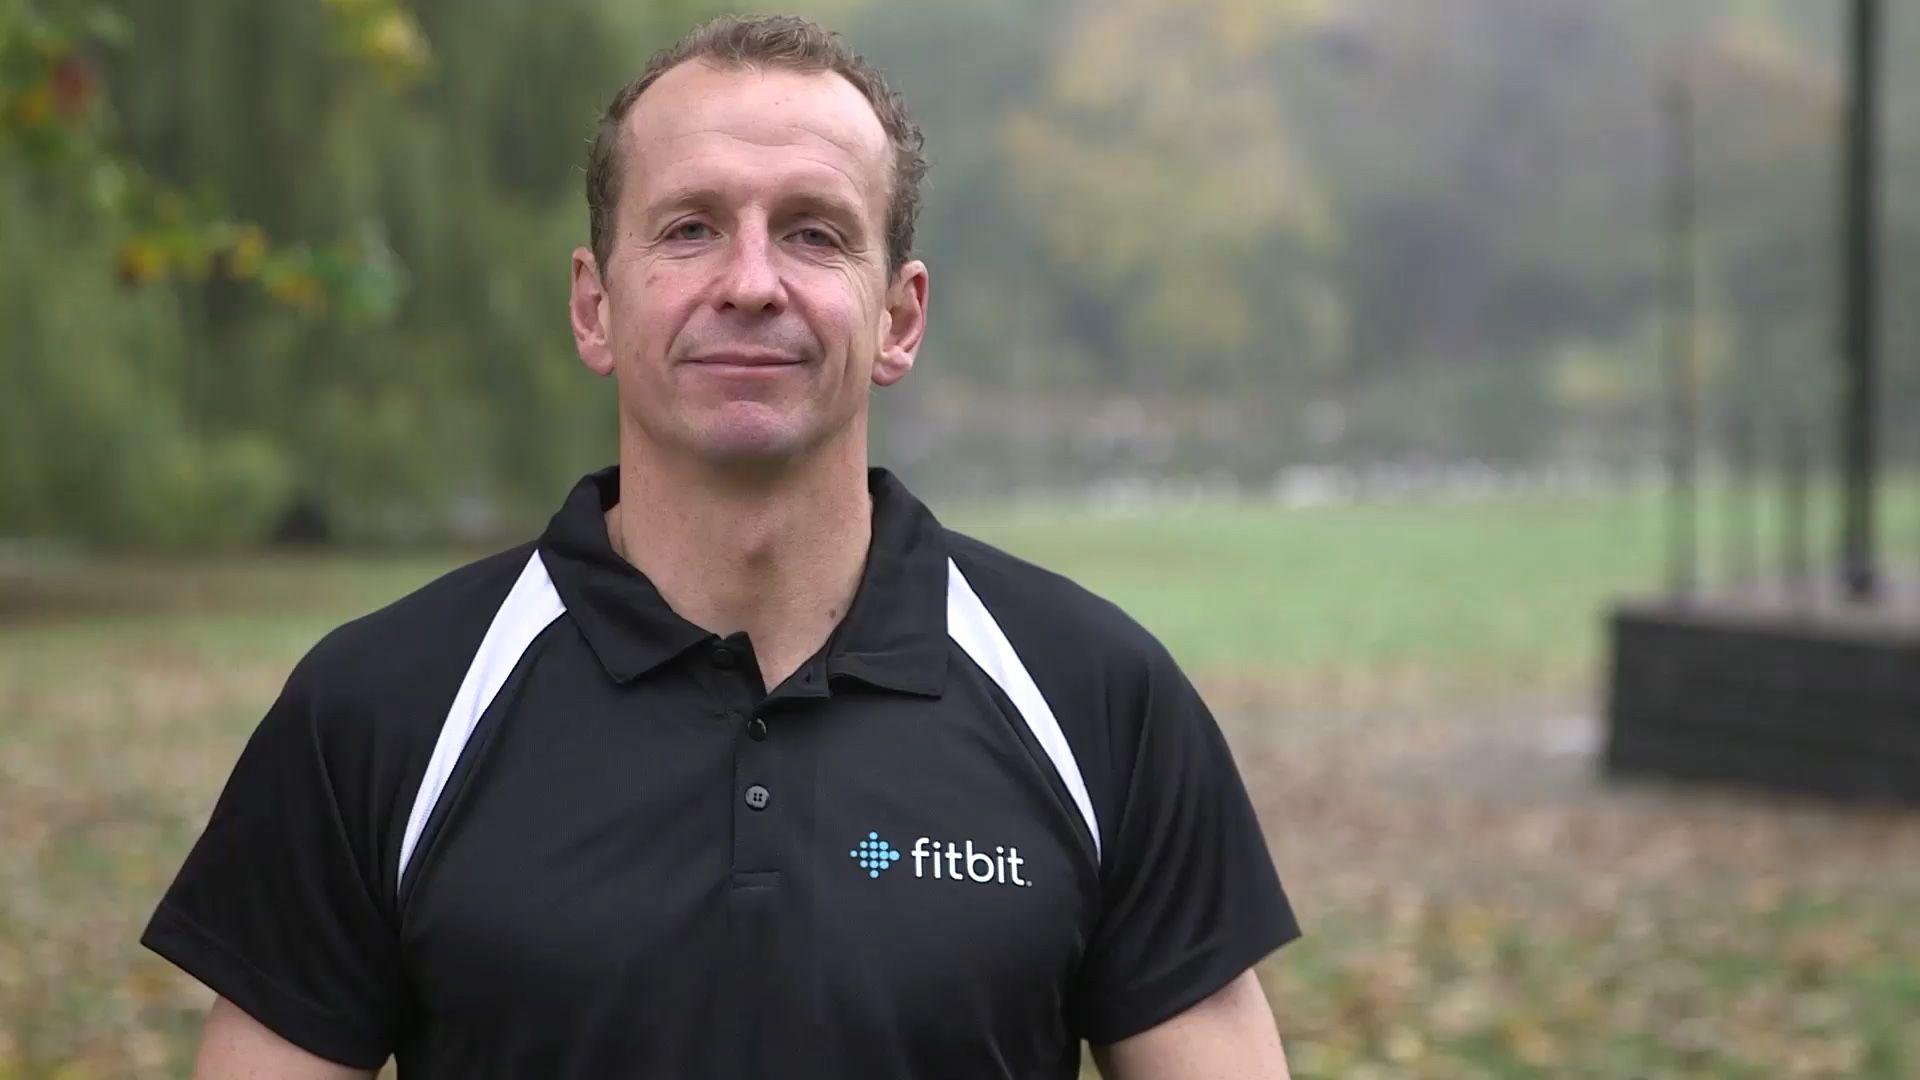 Greg whyte obe fitbit uk ambassador mens polo shirts